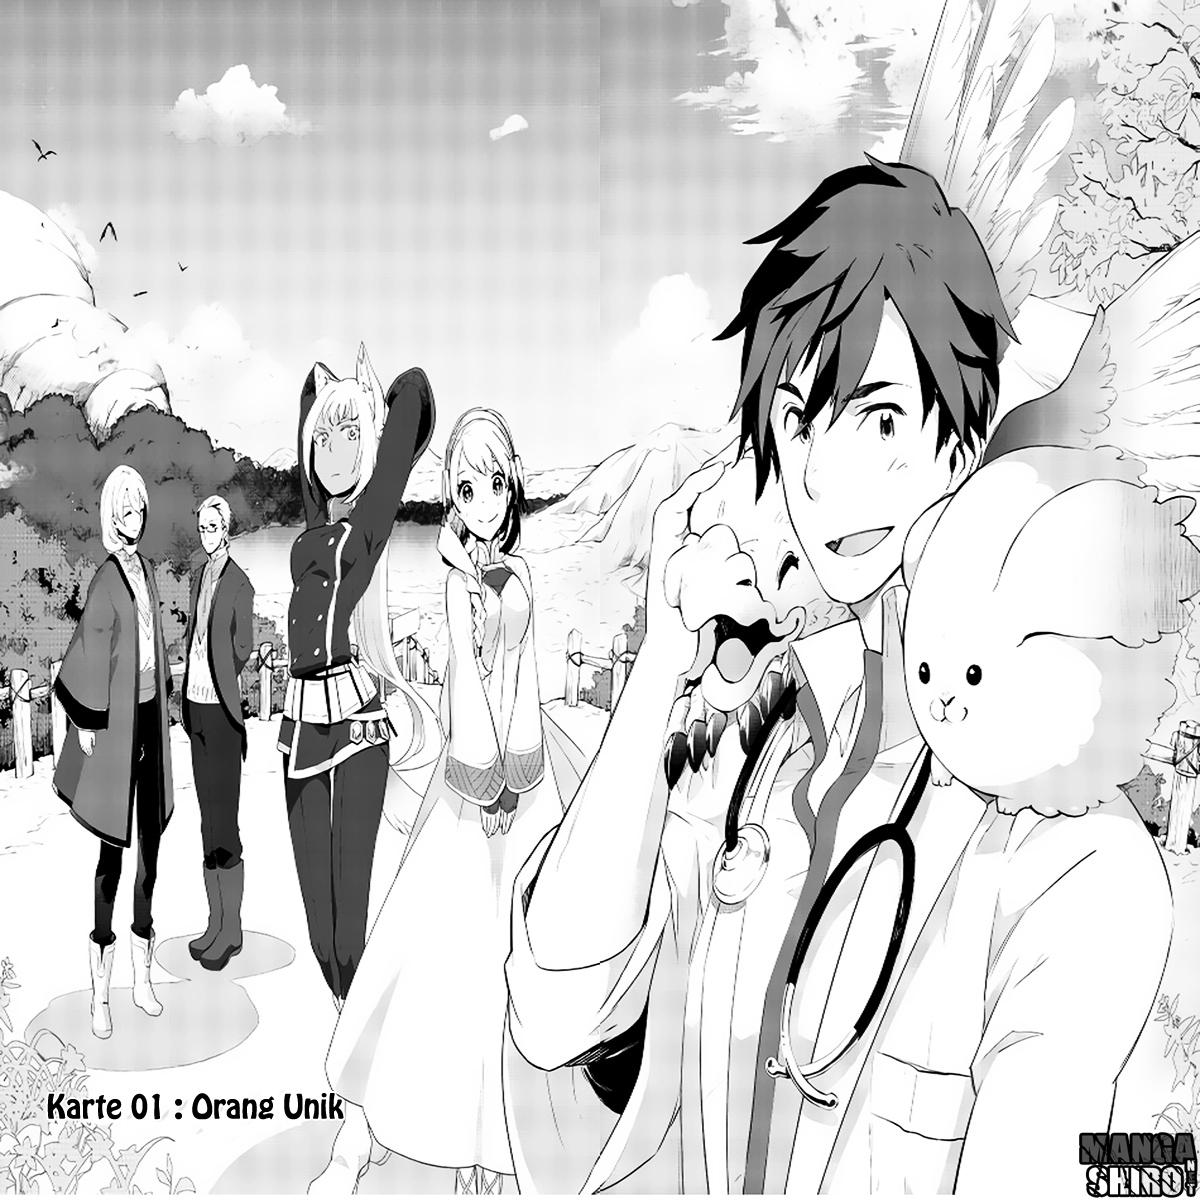 Dilarang COPAS - situs resmi www.mangacanblog.com - Komik jui san no oshigoto isekai 001 - chapter 1 2 Indonesia jui san no oshigoto isekai 001 - chapter 1 Terbaru 4|Baca Manga Komik Indonesia|Mangacan